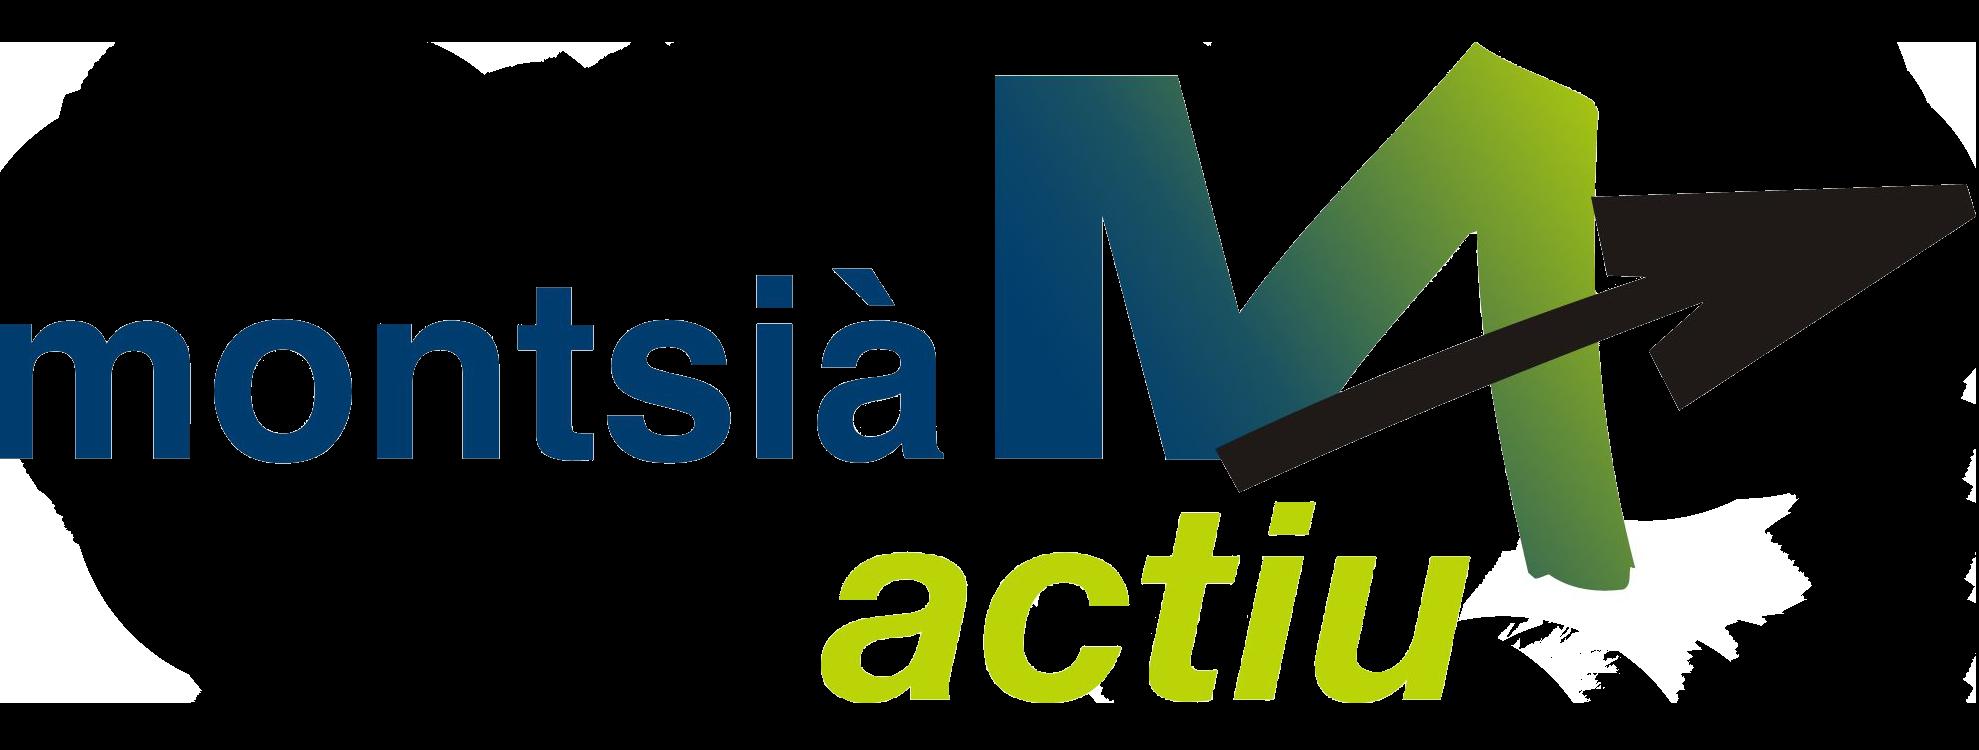 Montsia_actiu_t_marge2